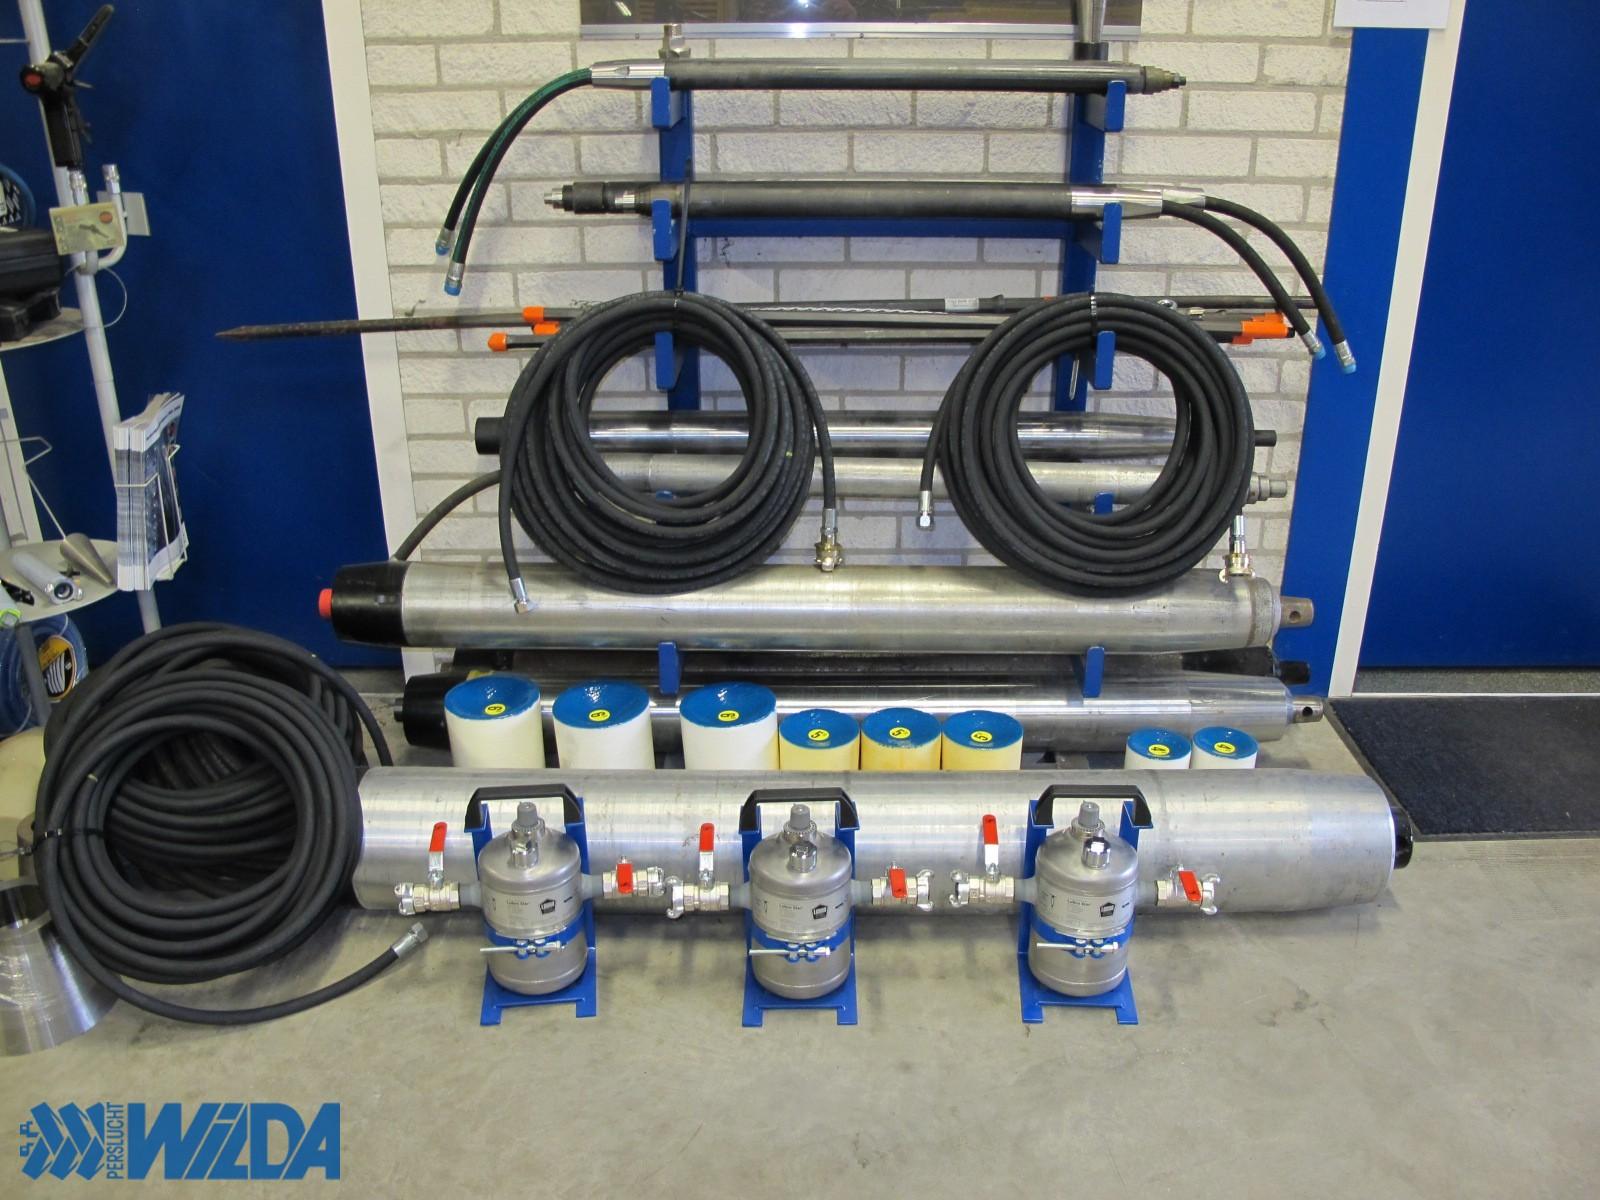 Bodemraketten-Essig bodemraket-IP-240D